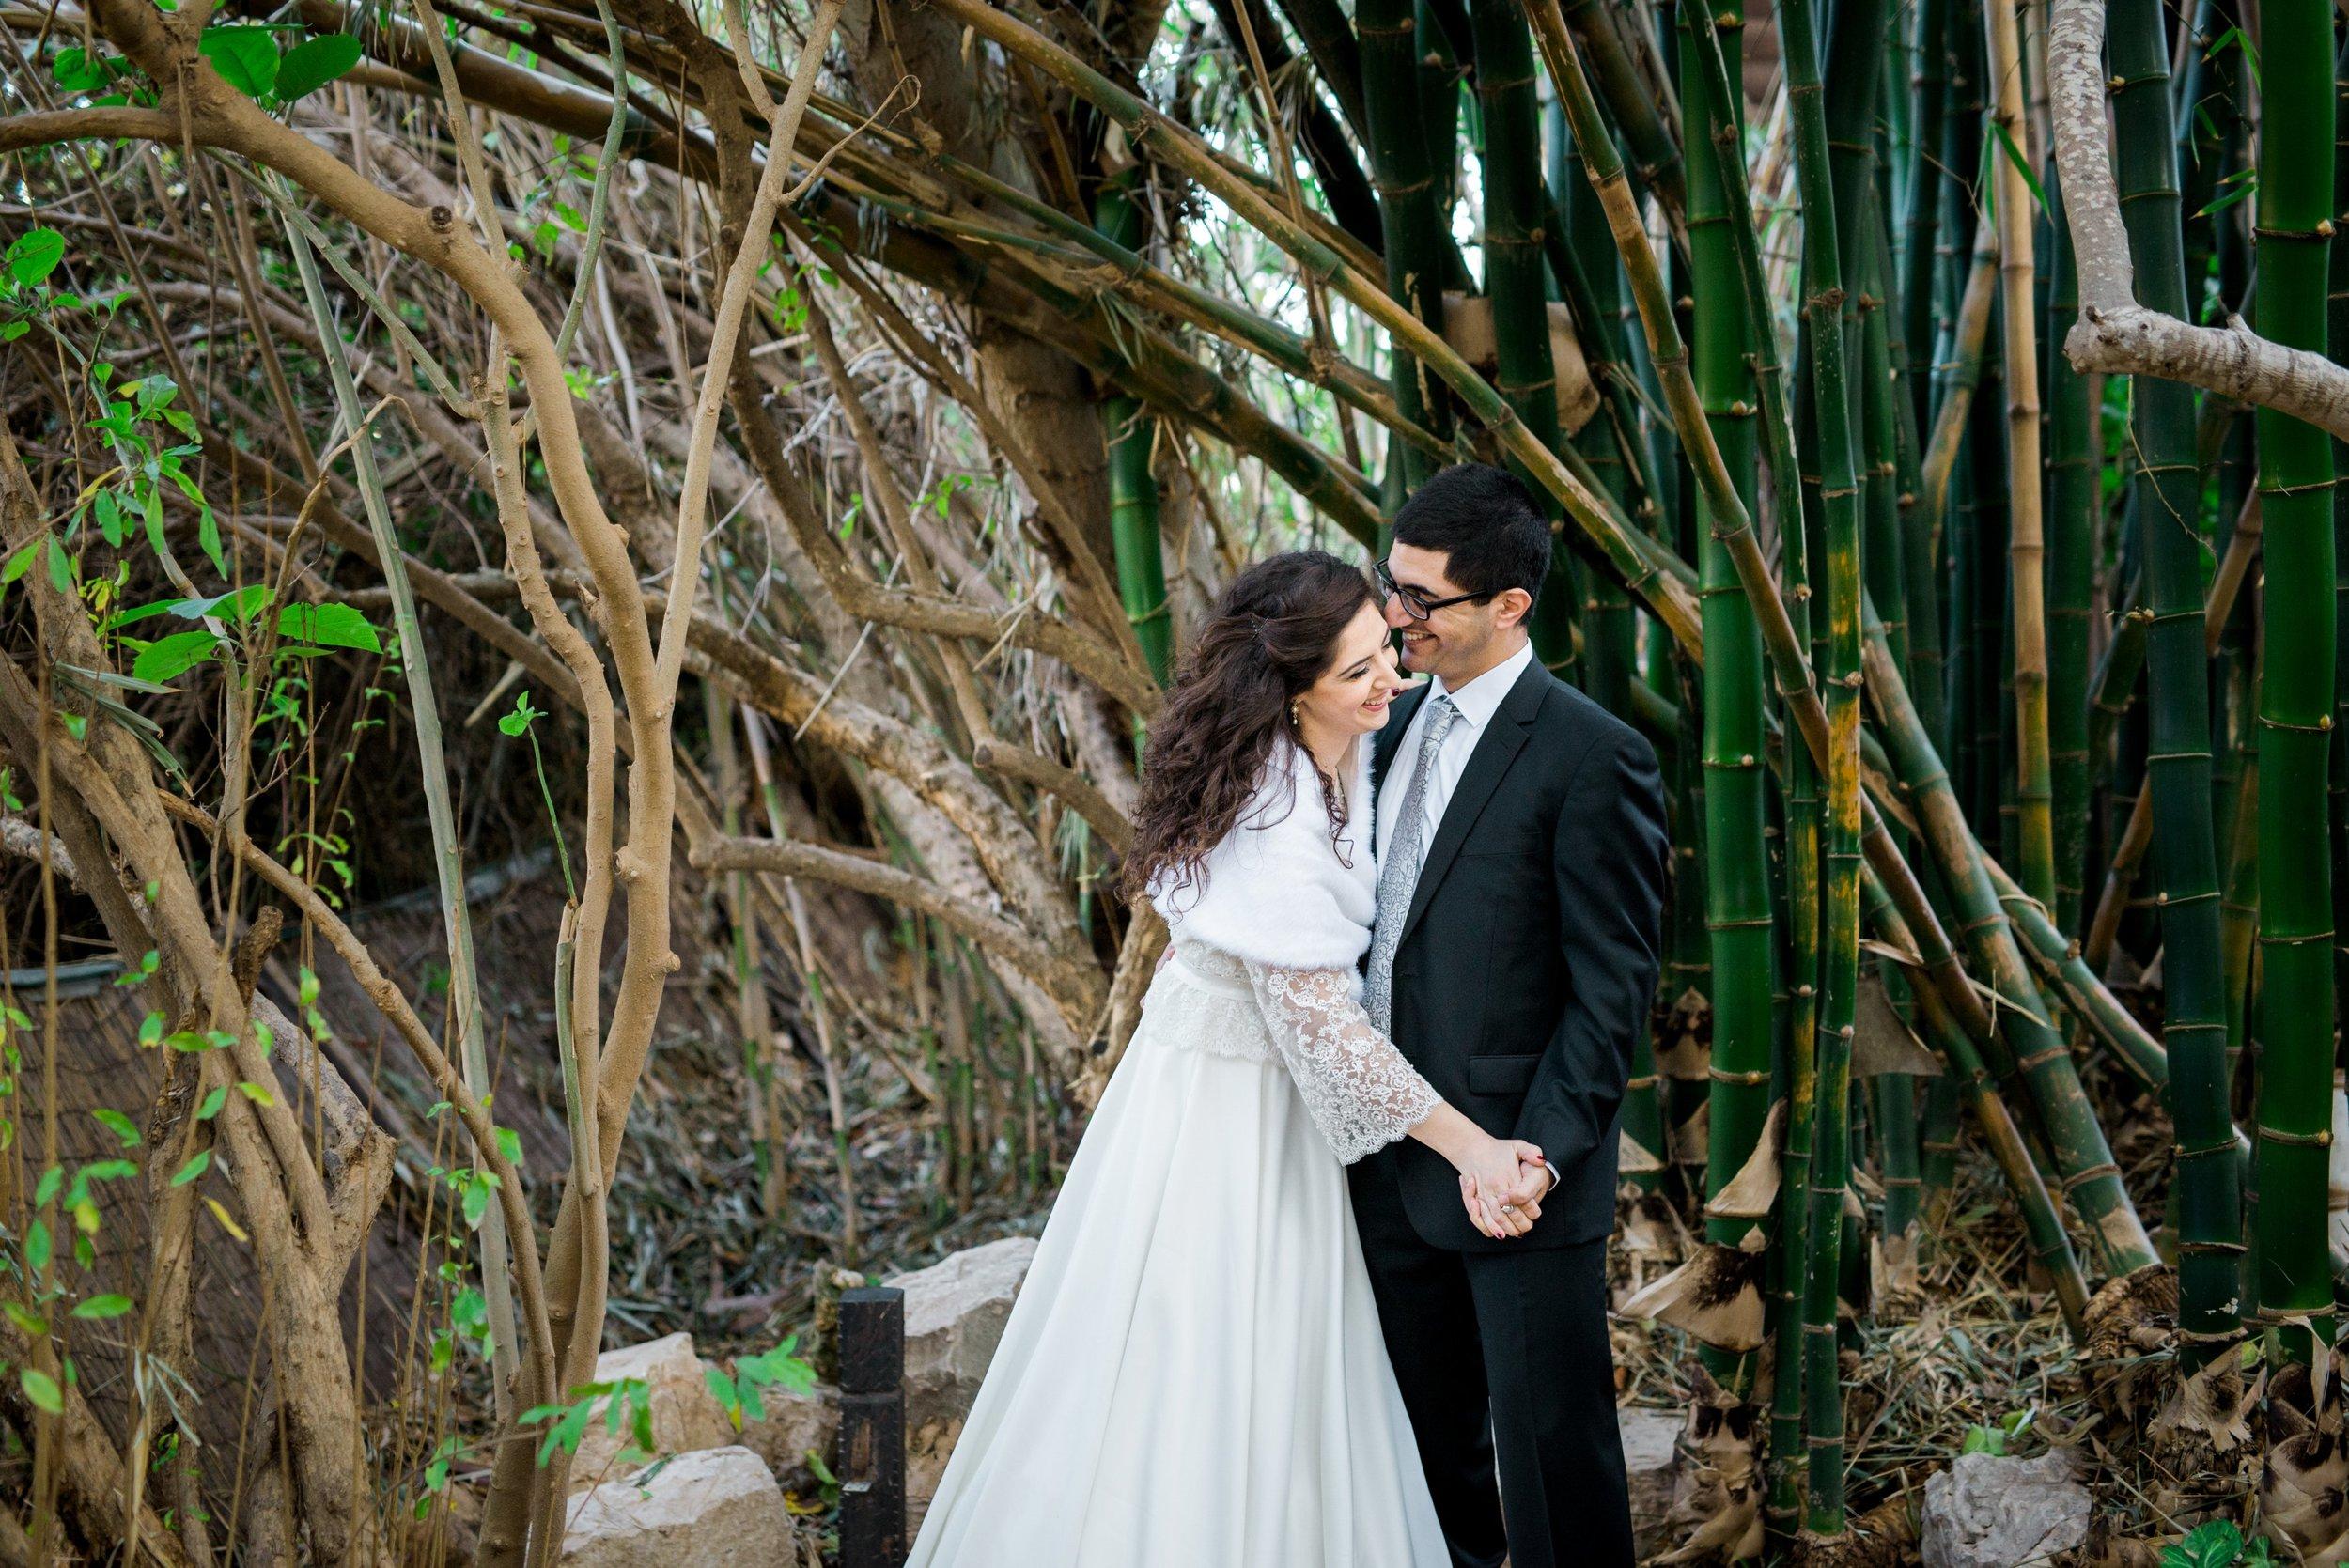 israel-garden-wedding-portraits-session-kate-giryes-photography--32_WEB.jpg